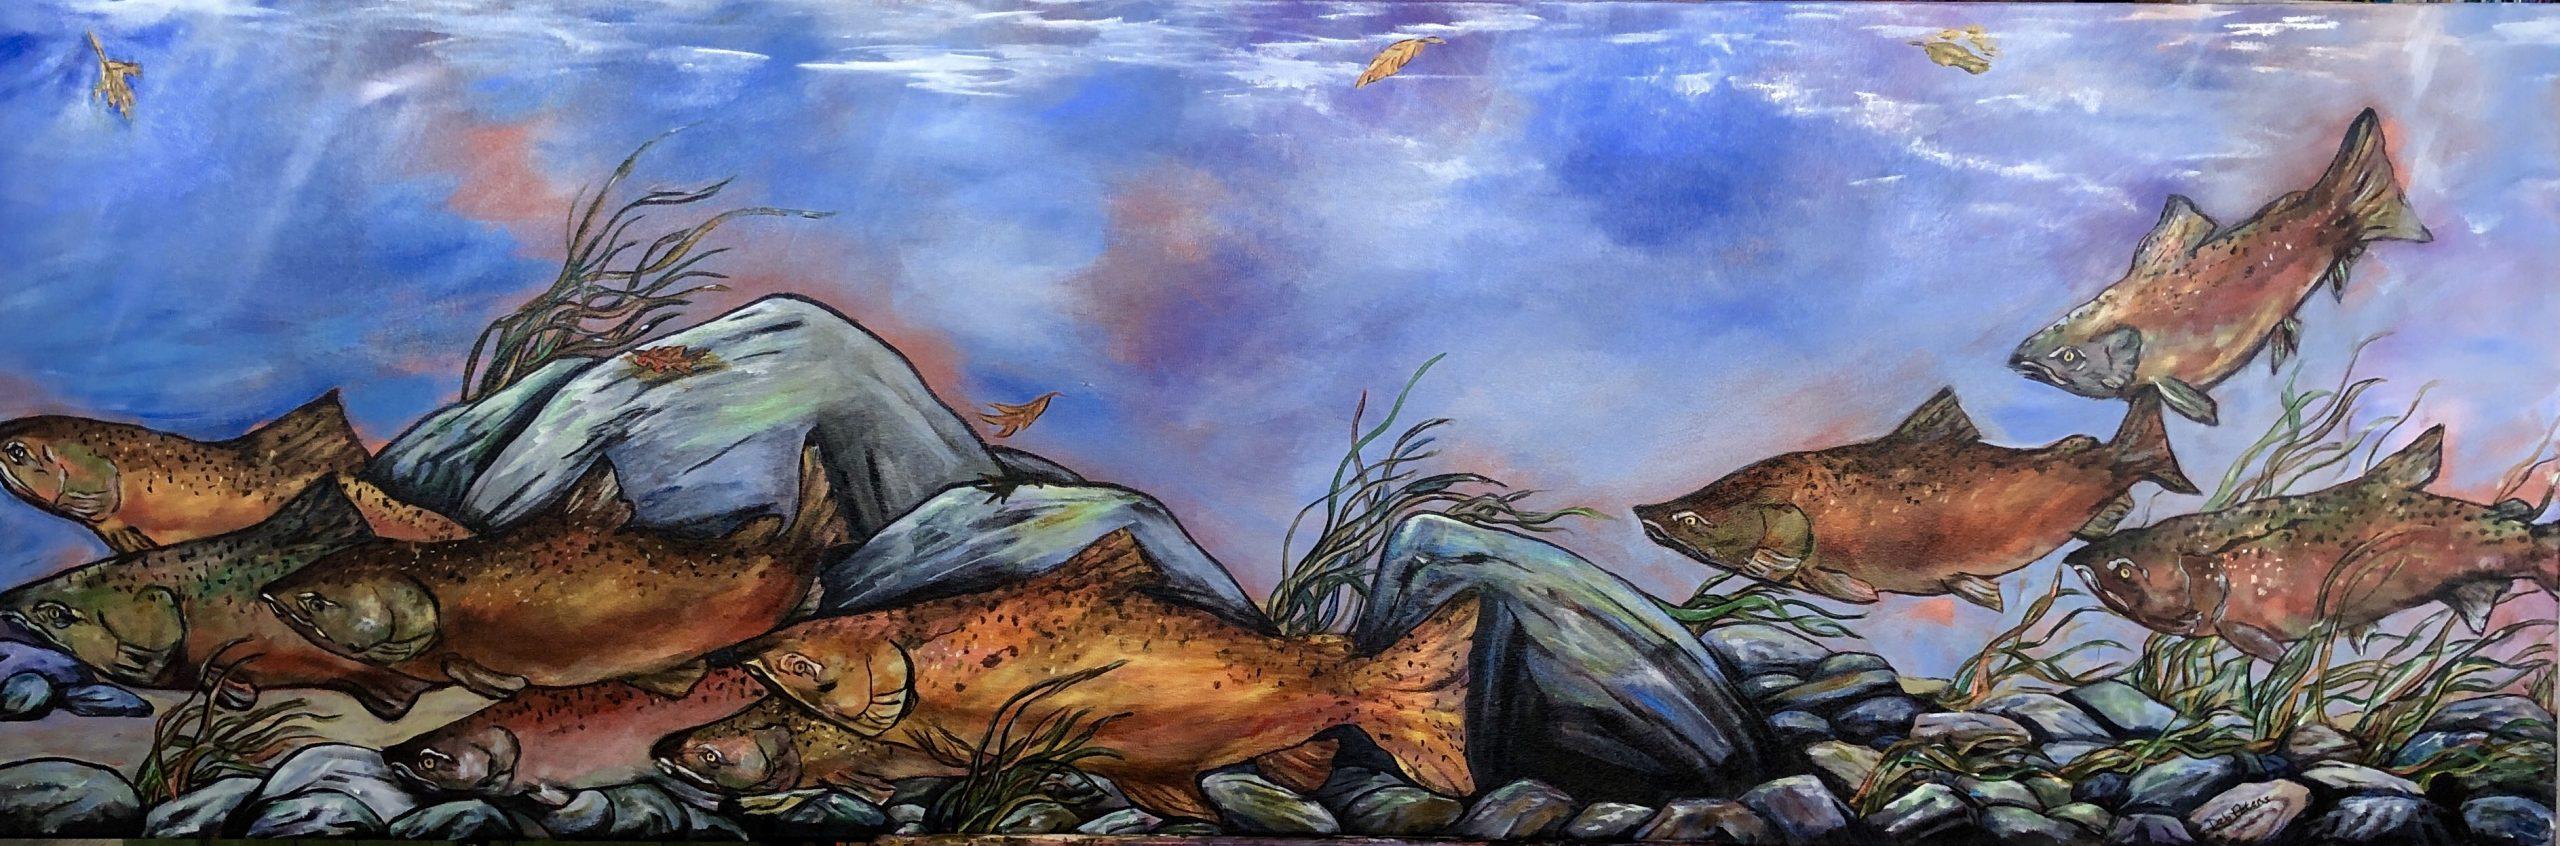 Salmon Days